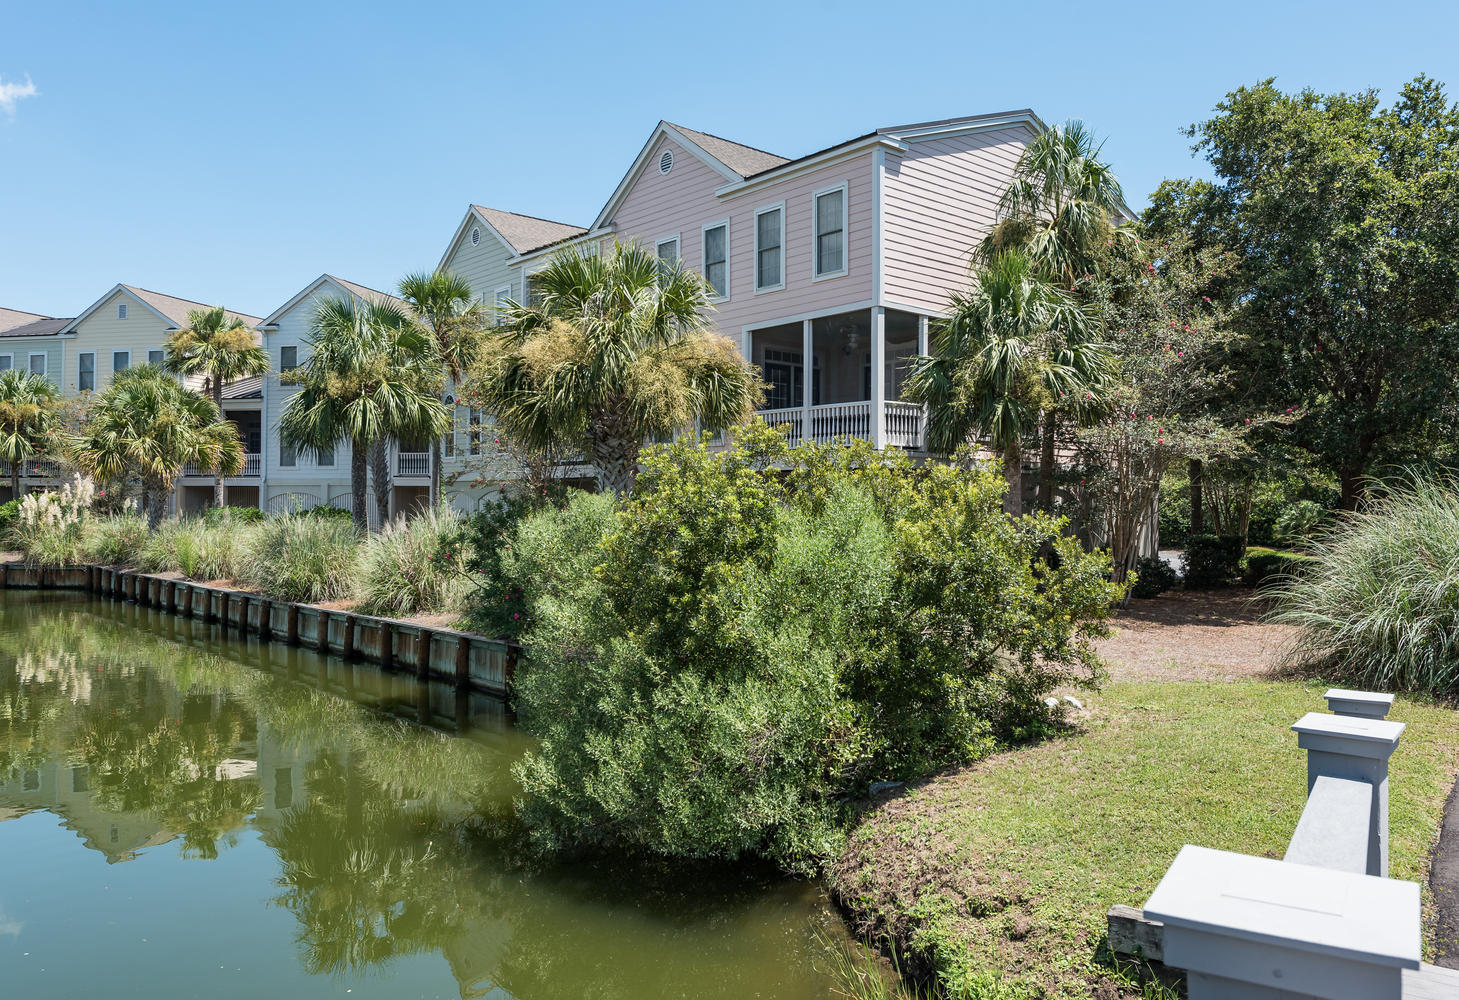 Seabrook Island Homes For Sale - 2439 Racquet Club, Seabrook Island, SC - 25